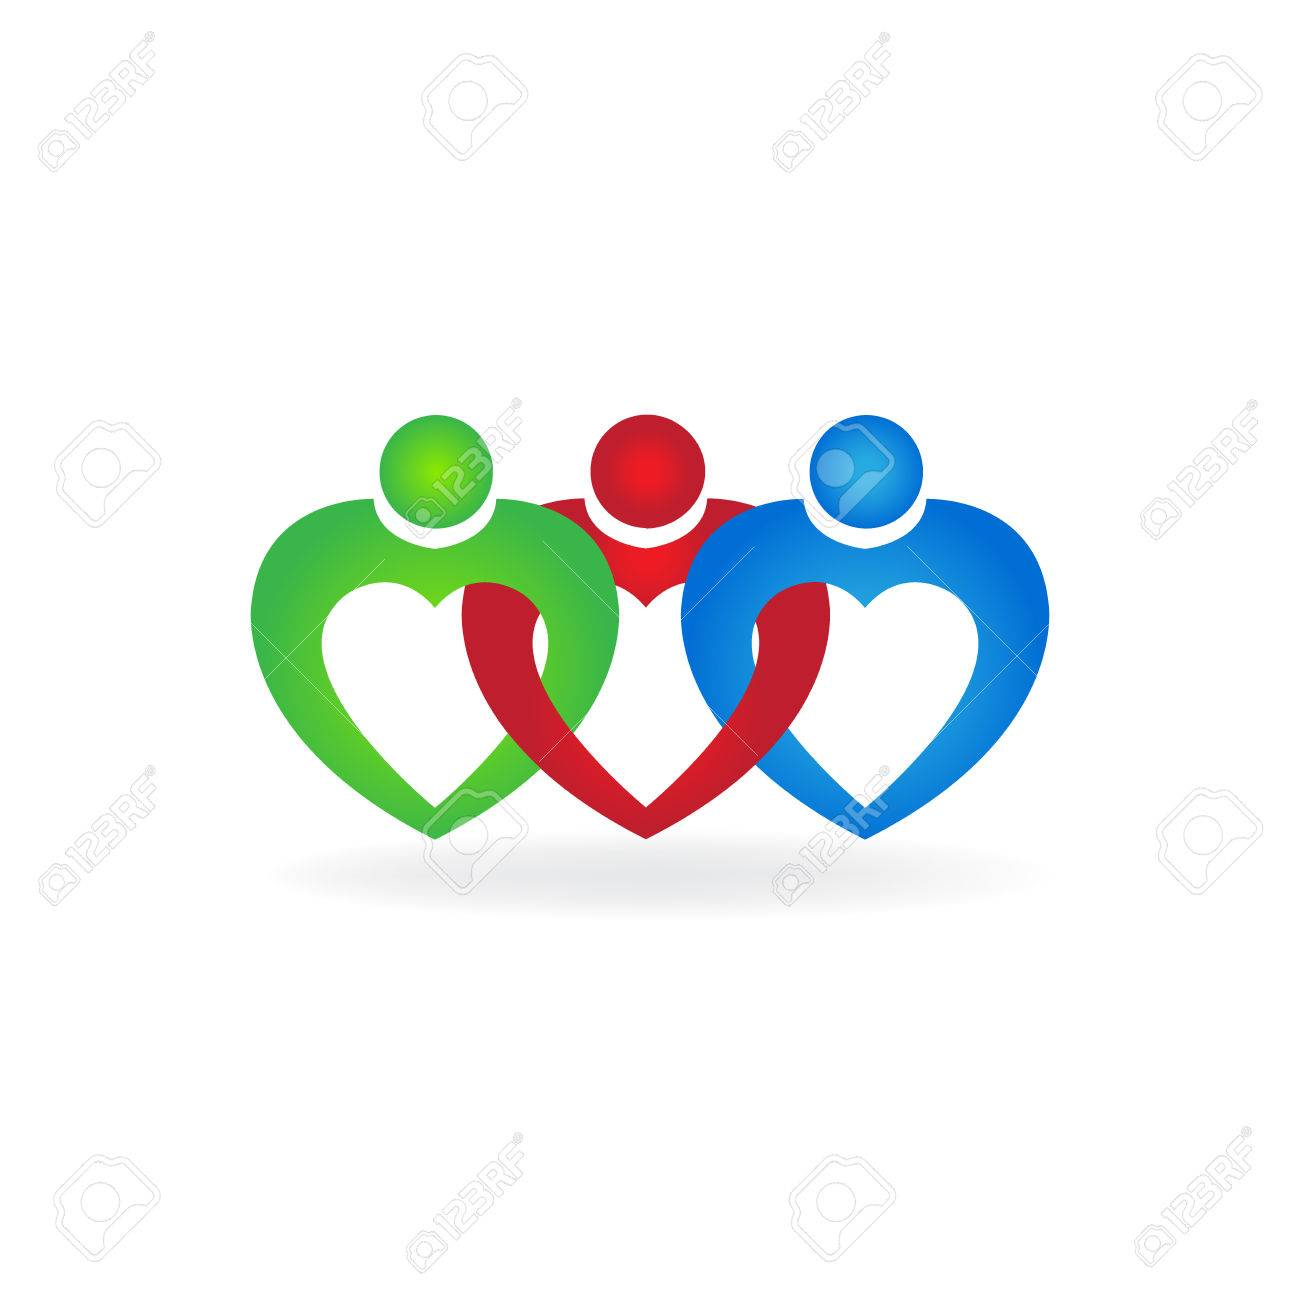 Coeur Amour Travail Dequipe Unite Personnes Carte De Visite Icone